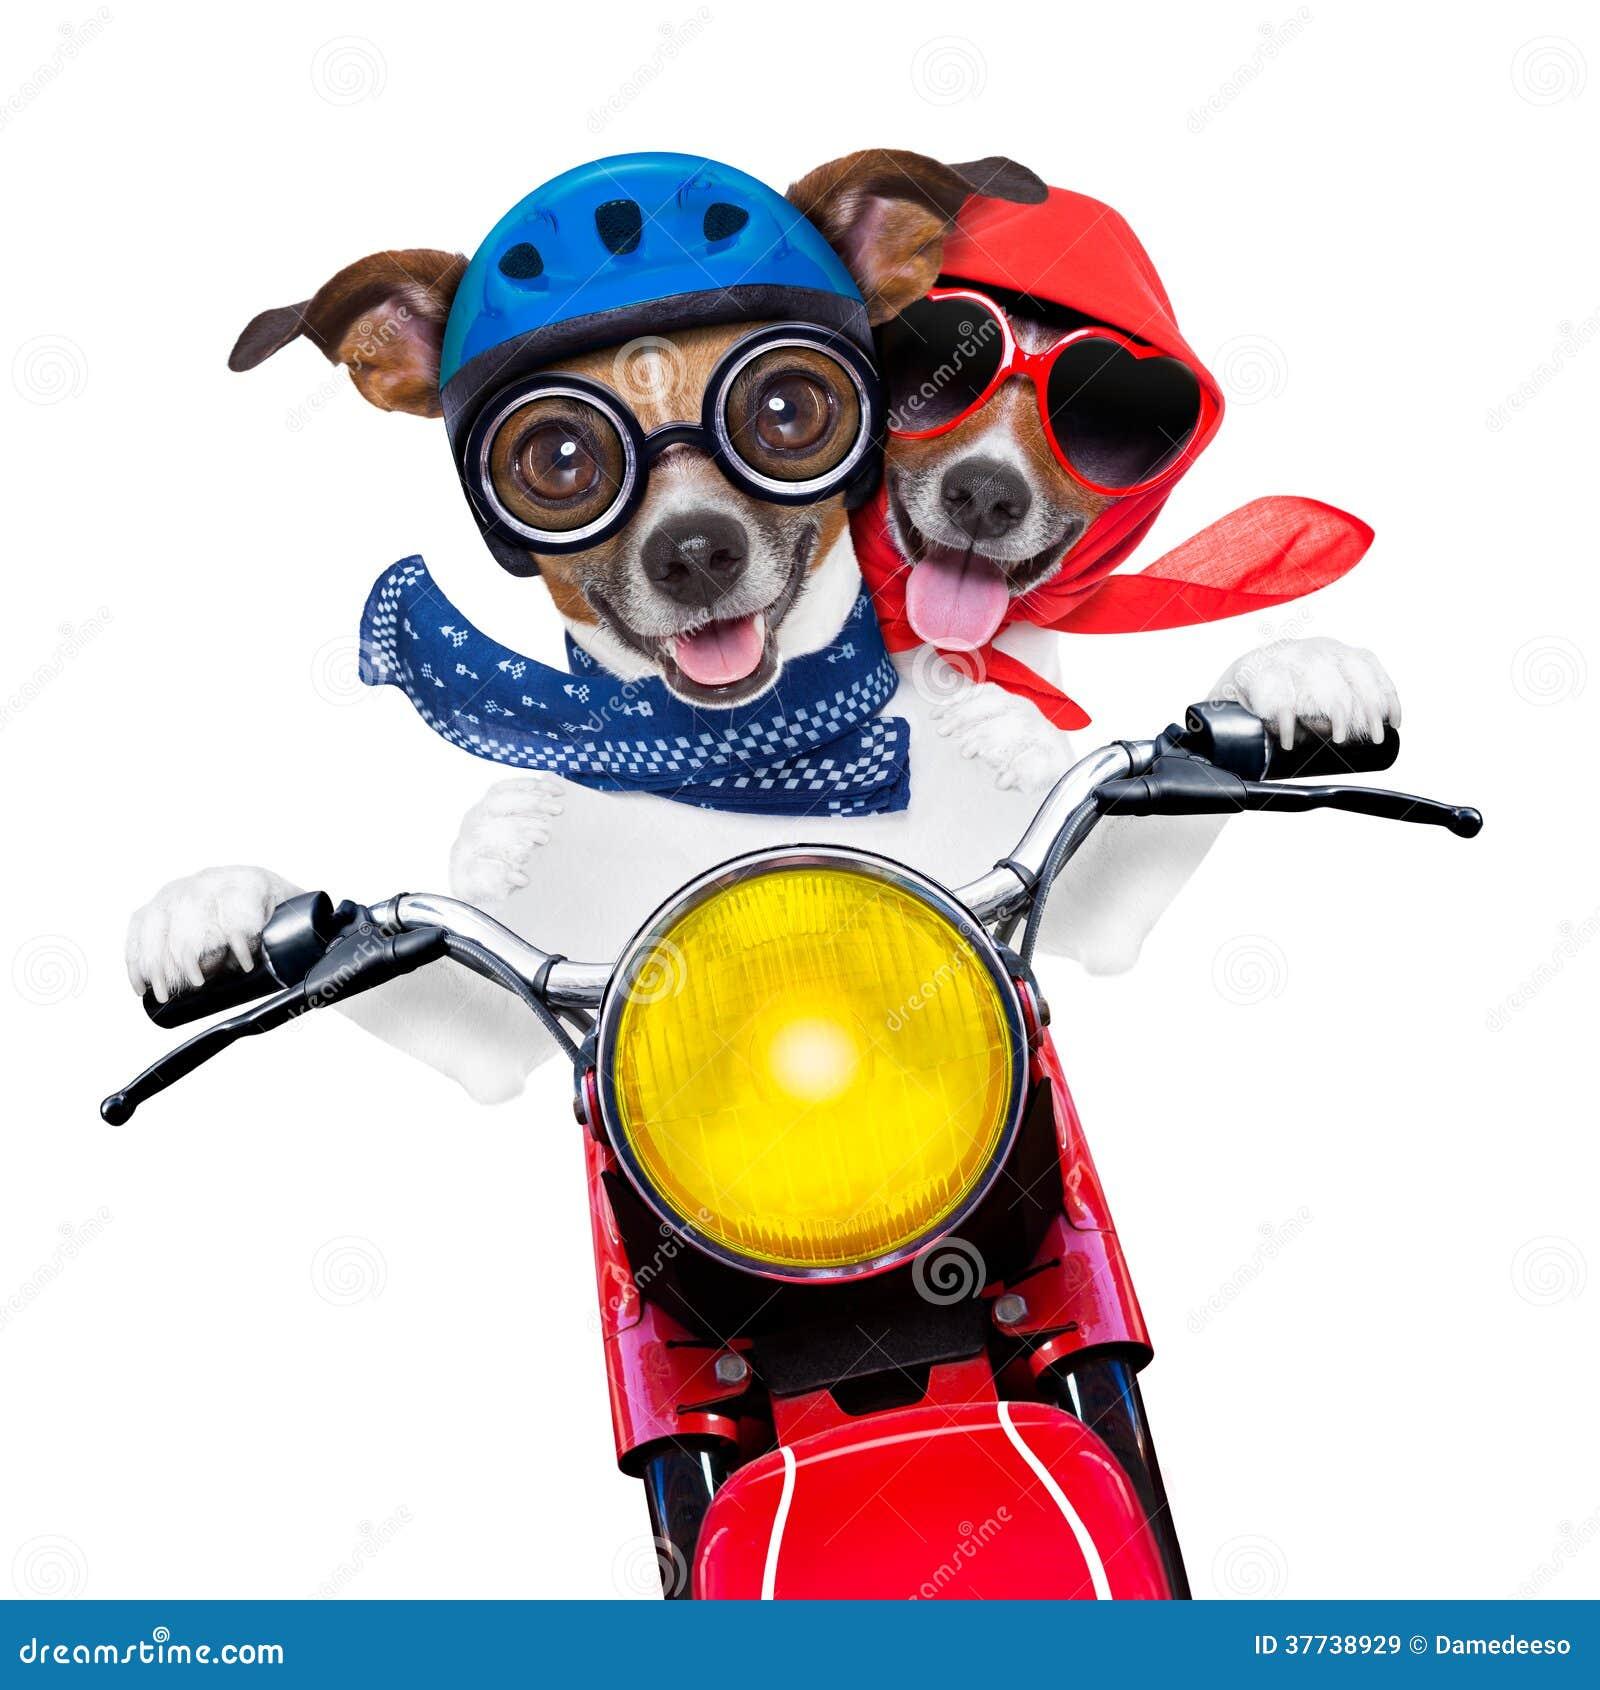 Motorbike couple of dogs